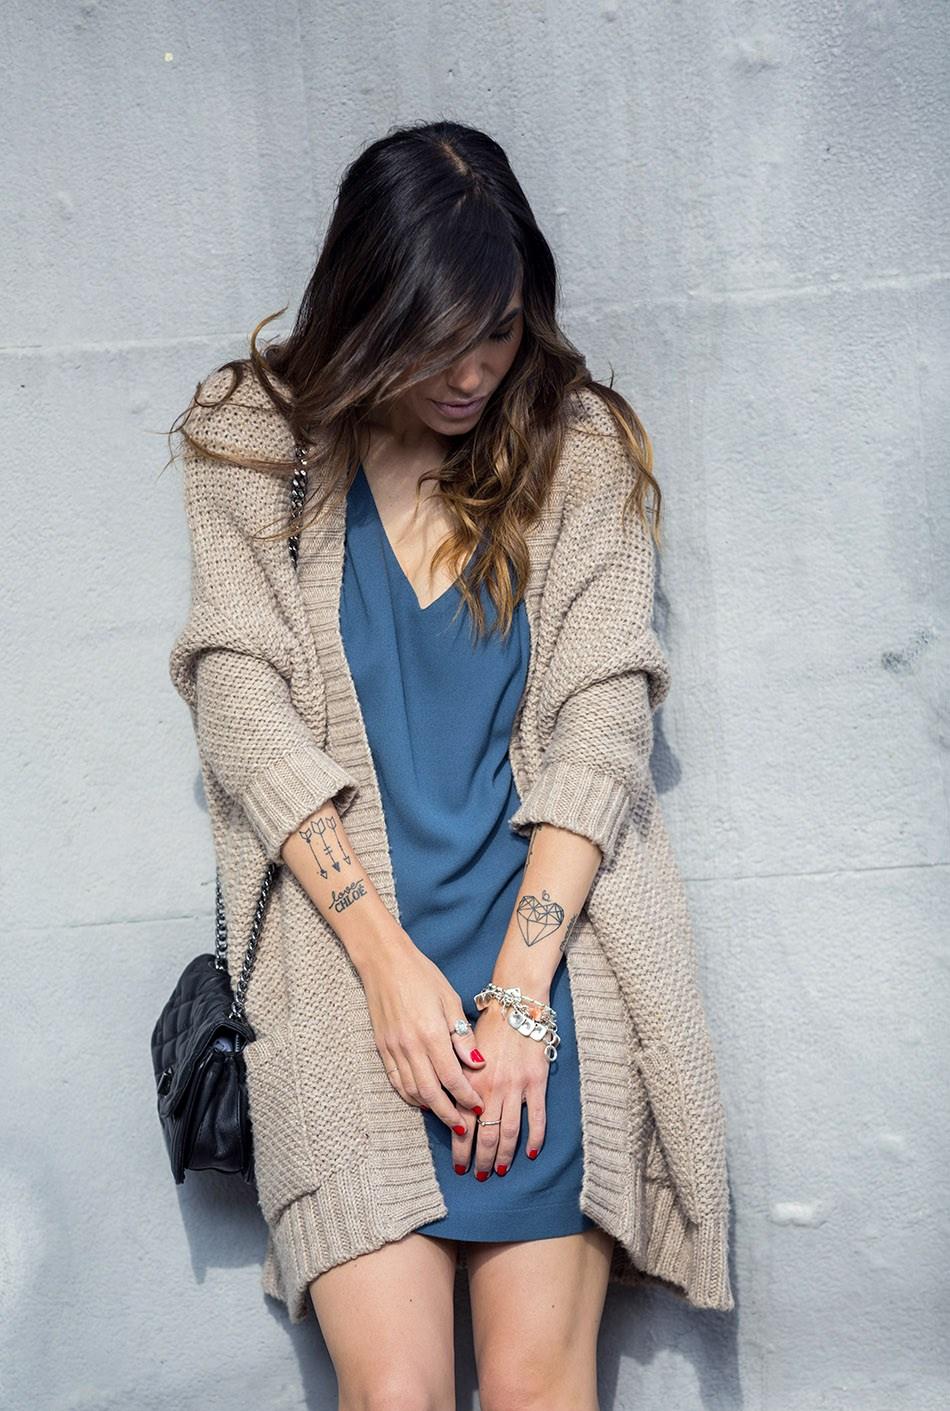 street style june 2016 outfits review bárbara crespo 07